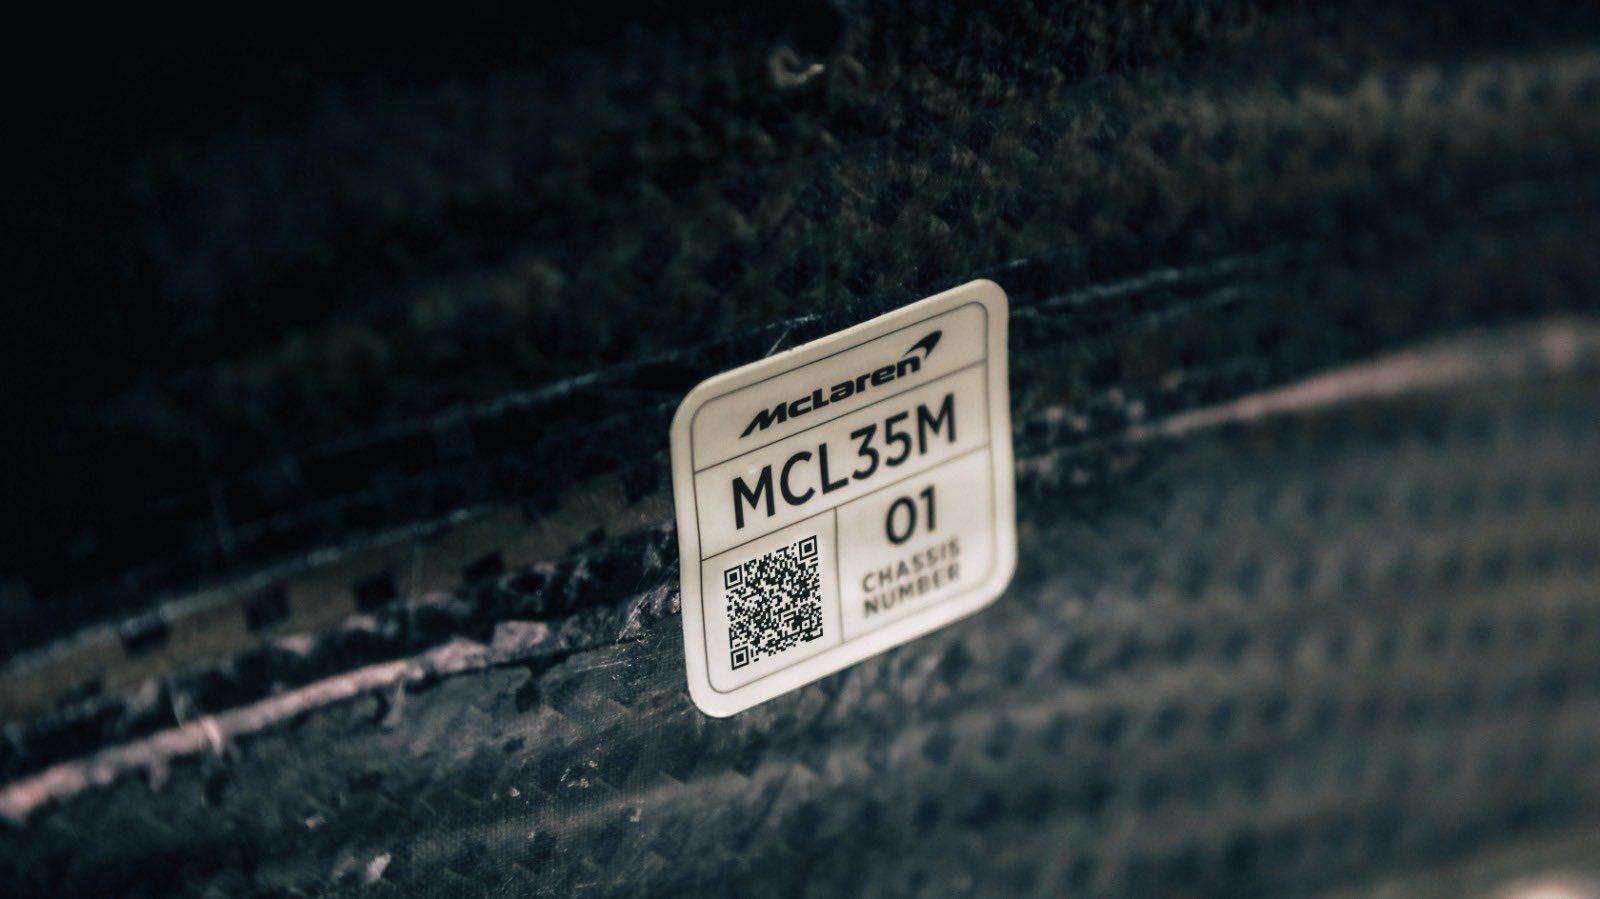 Así ruge el motor Mercedes en el nuevo McLaren MCL35M